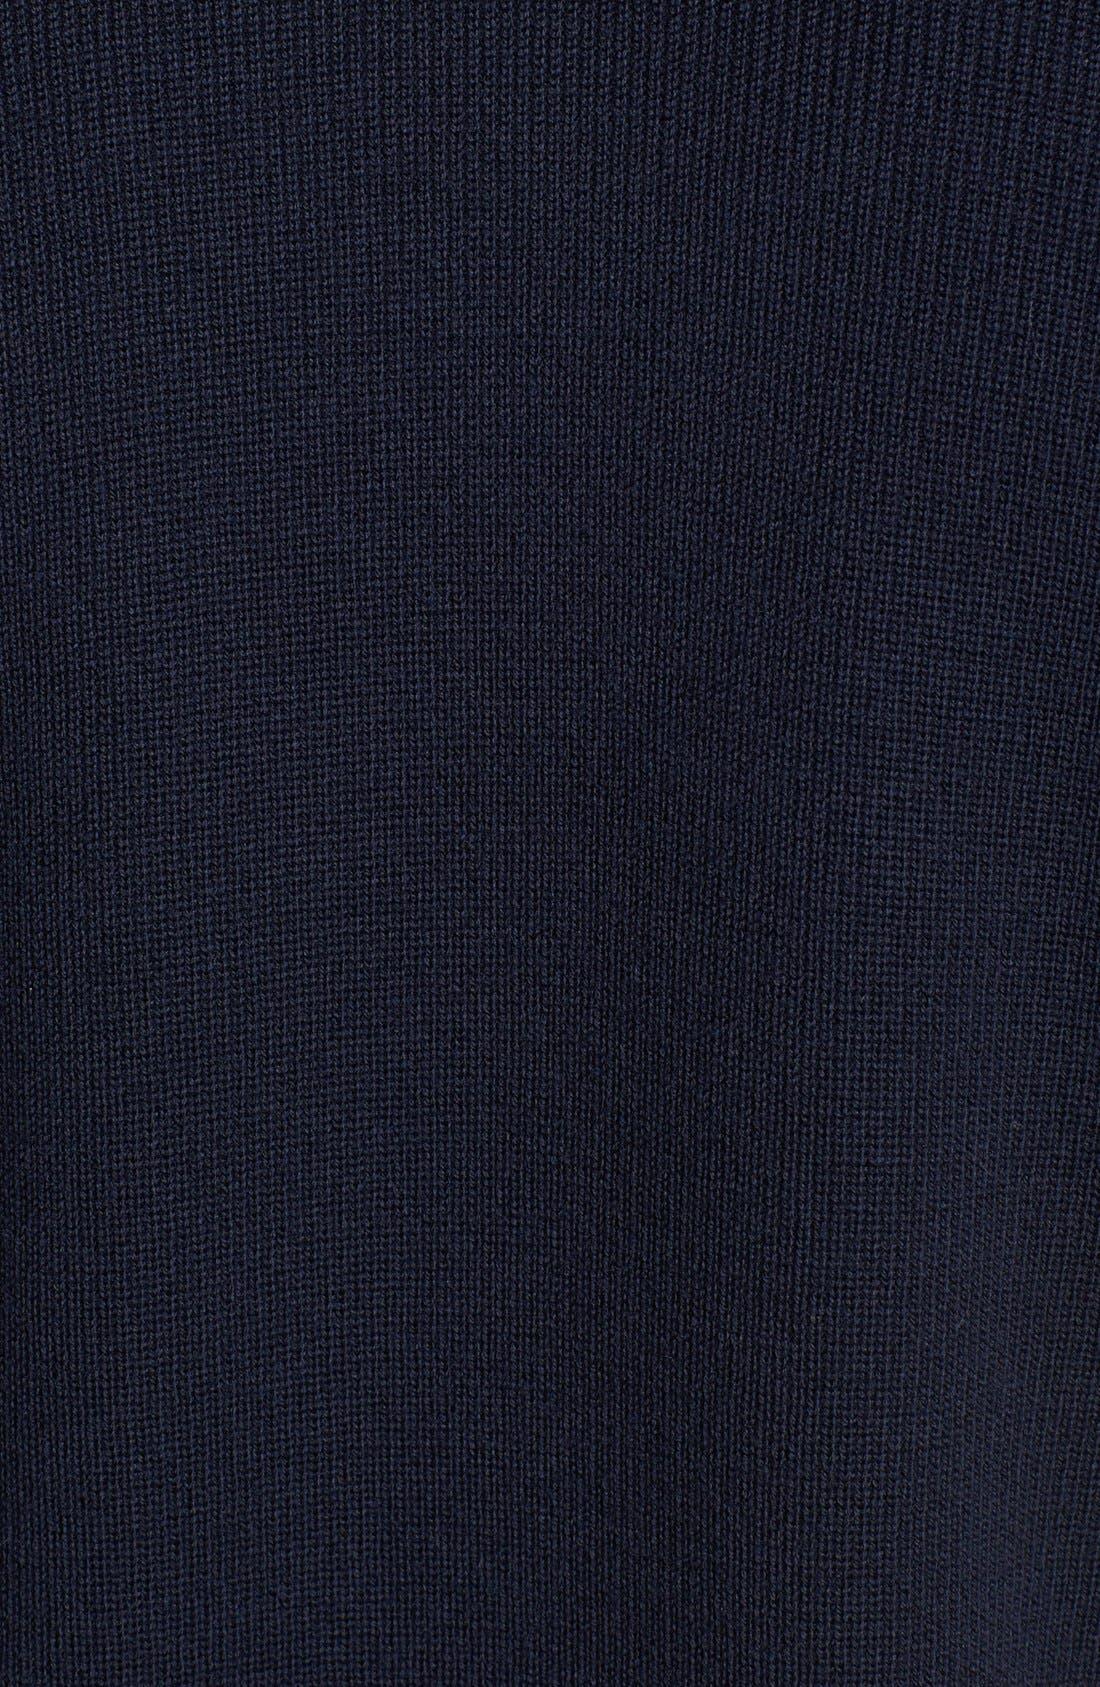 Alternate Image 3  - Zegna Sport Water Repellent Shawl Collar Sweater